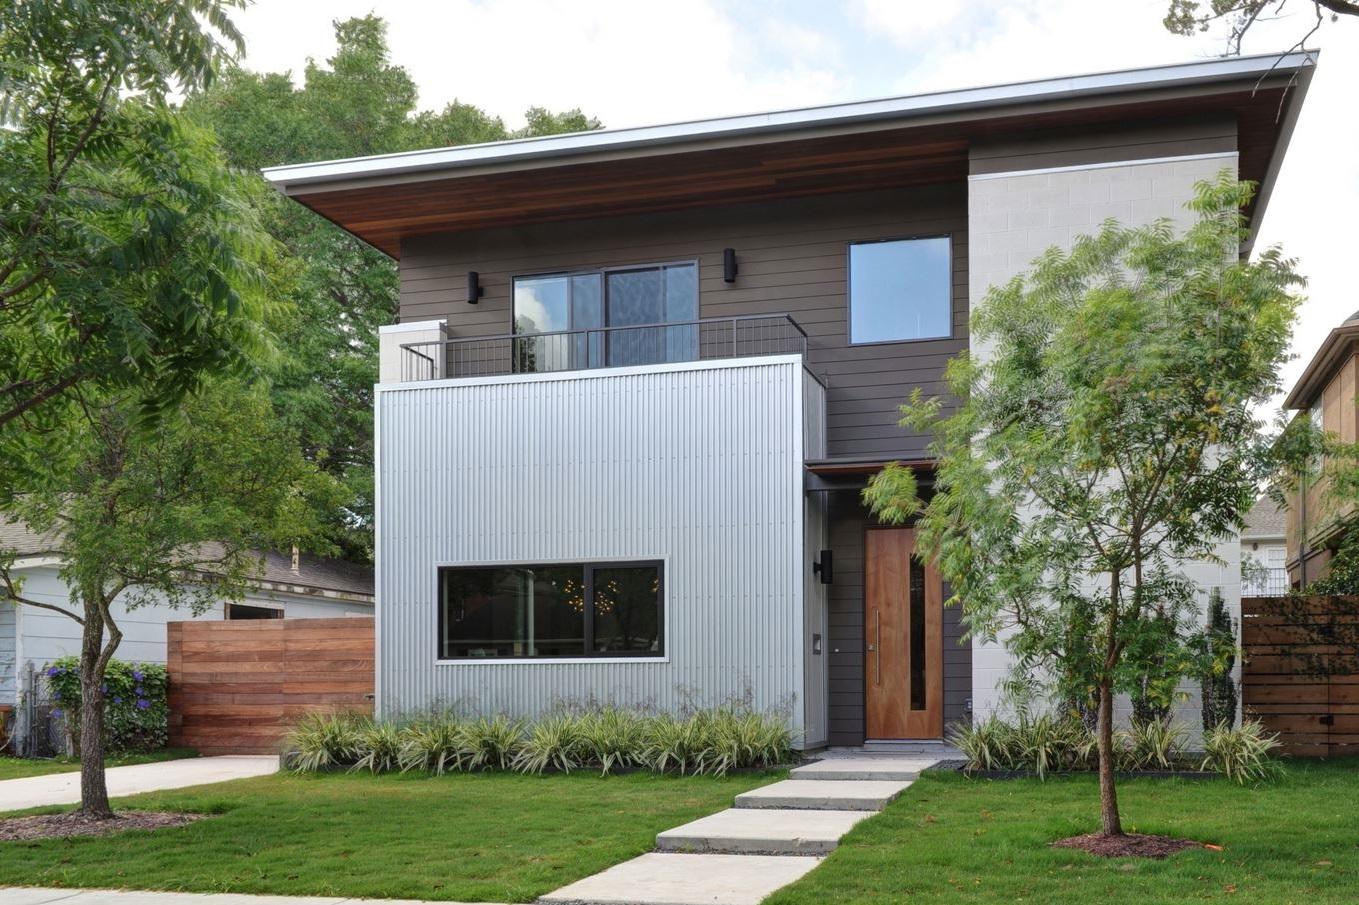 Fachada de casa sencilla y bonita for Fachada de casas modernas con porton